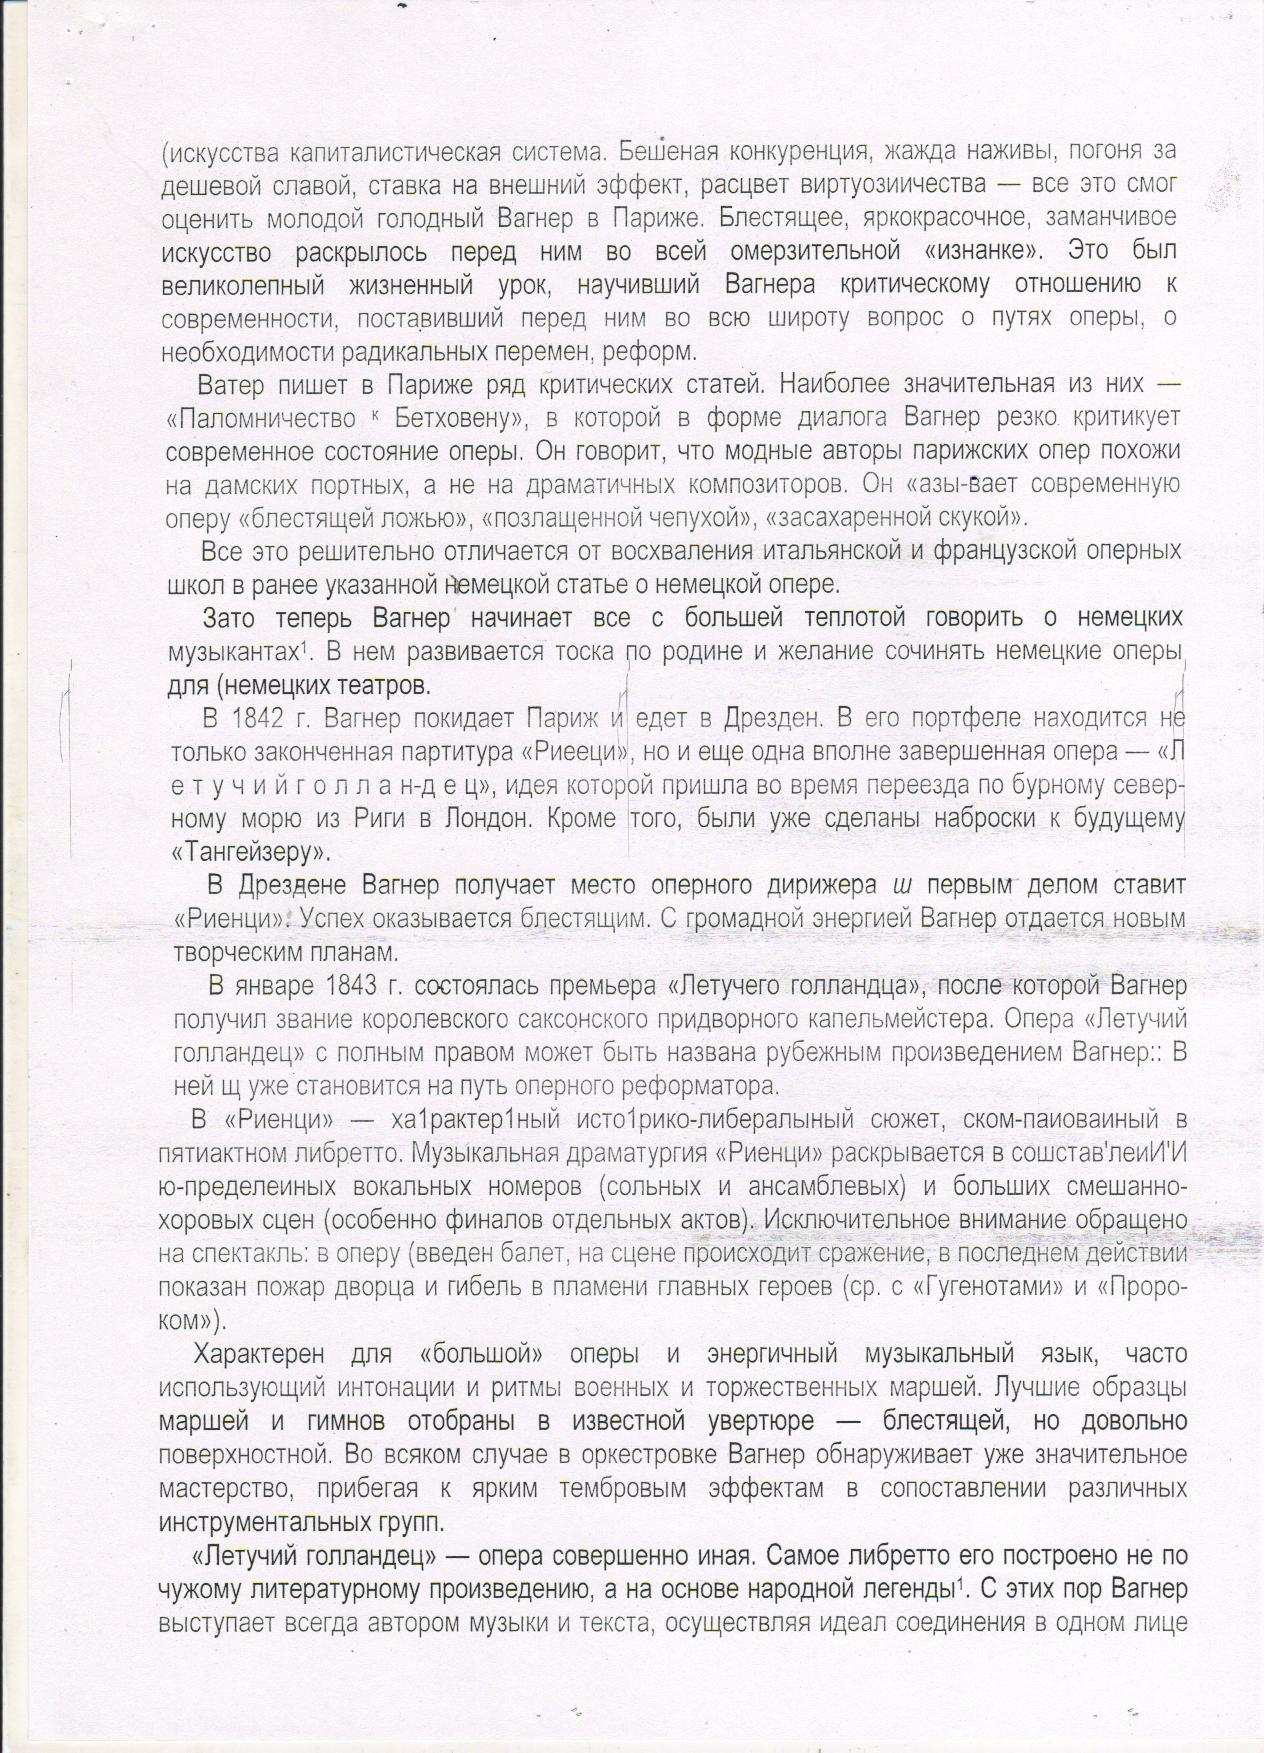 C:\Documents and Settings\Учитель\Рабочий стол\5.jpg